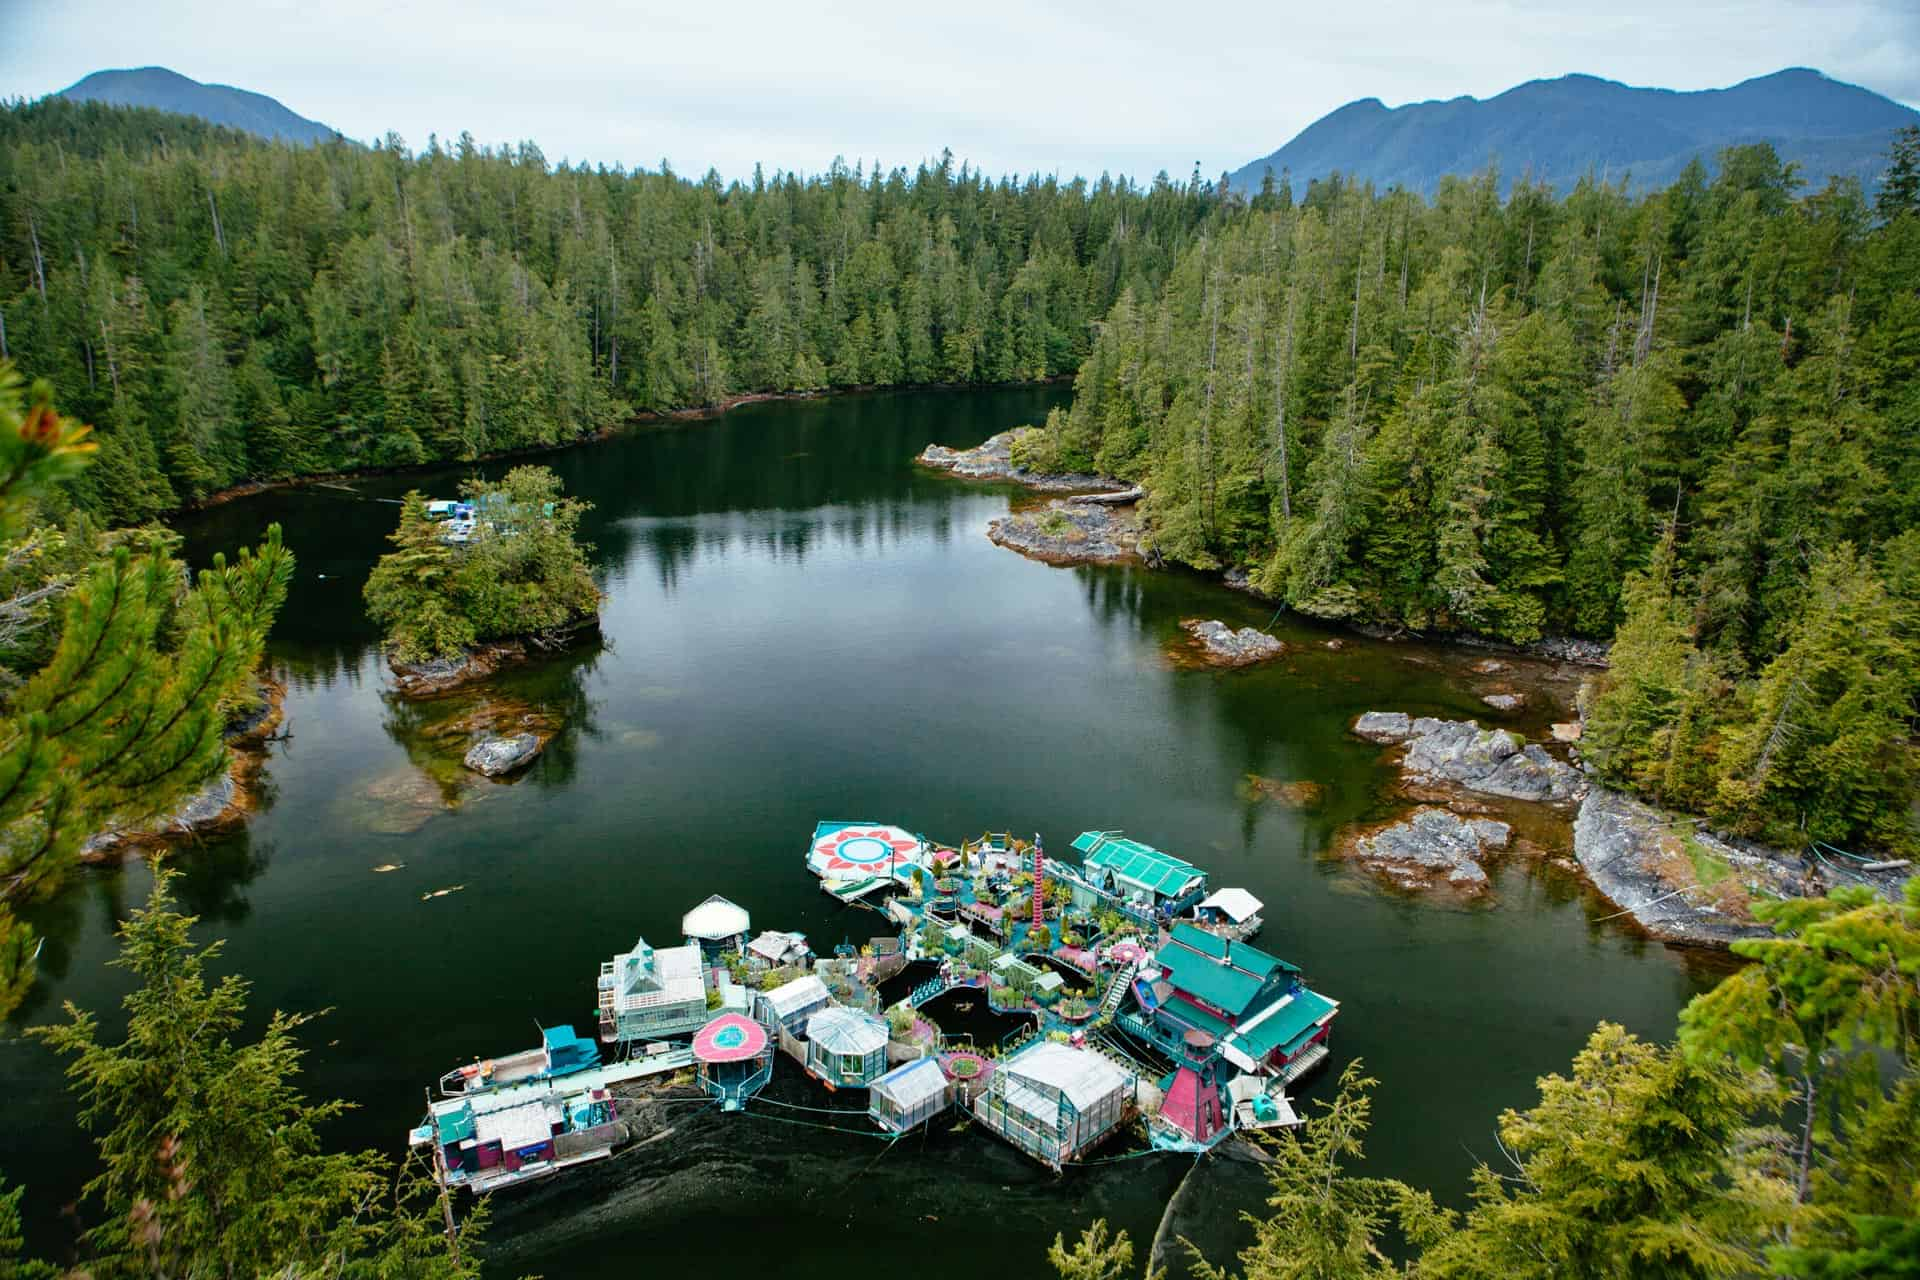 Cove Island Rentals